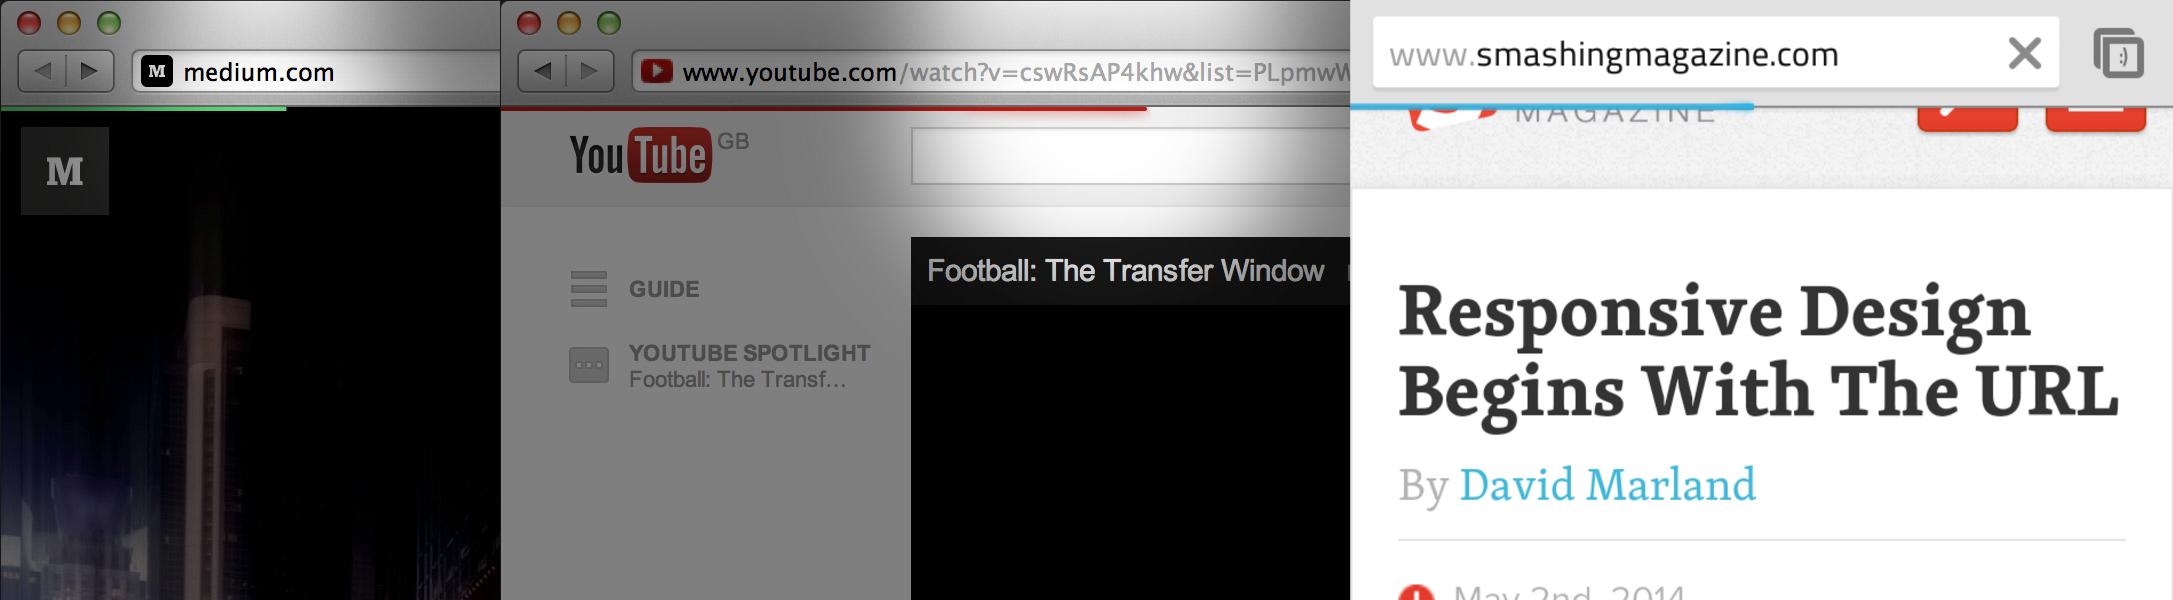 Website loading bars from Youtube, Medium and Chrome Mobile